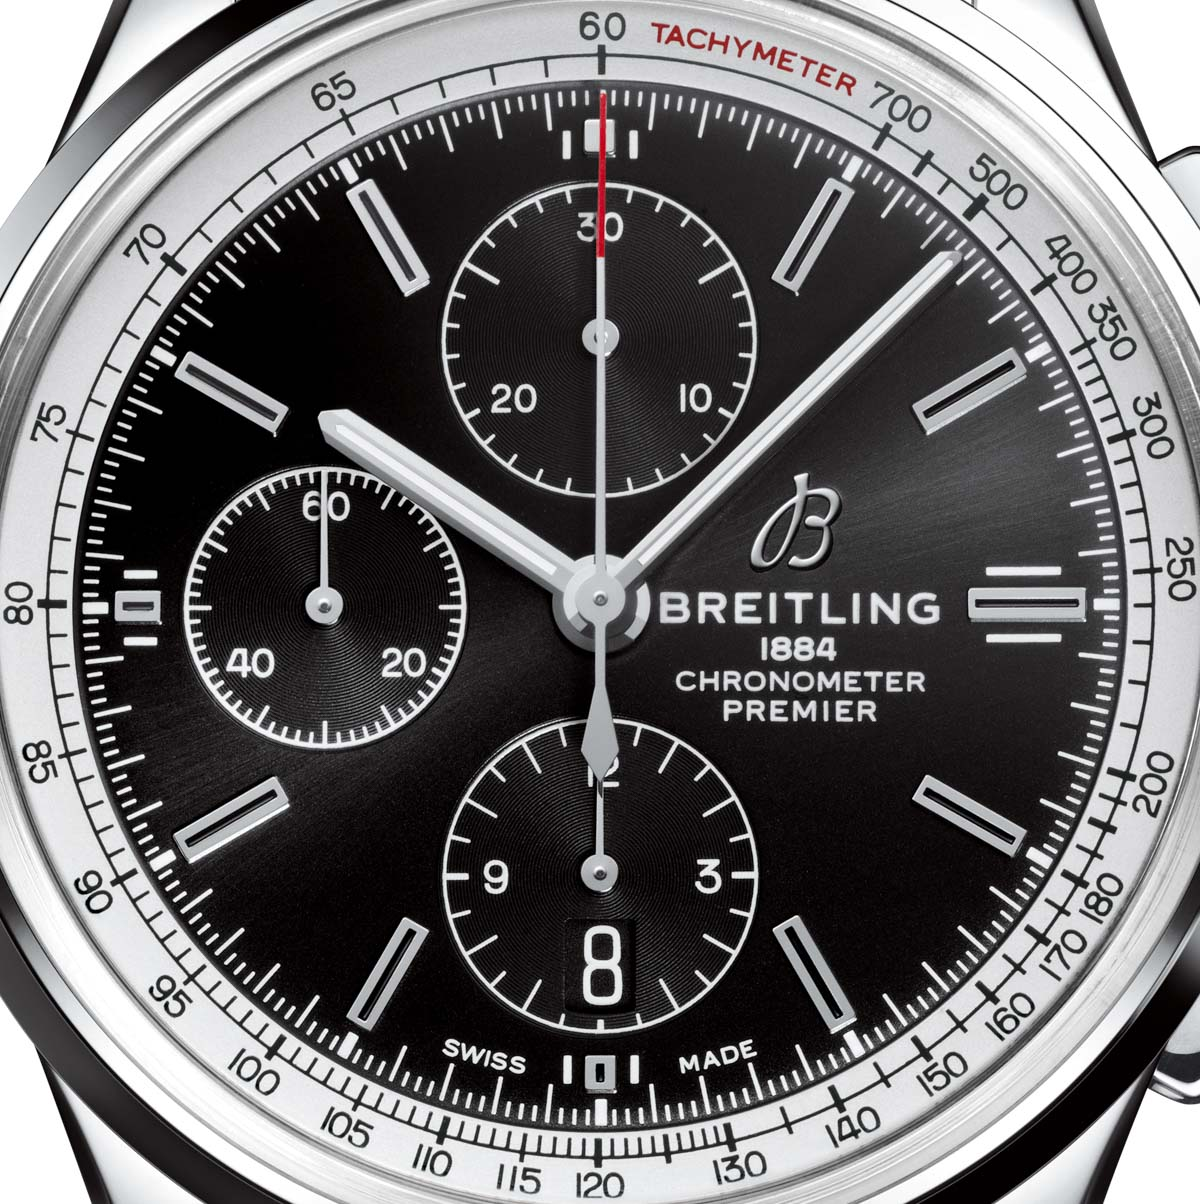 breitling-premier-chronograph-42mm-7750-5.jpg